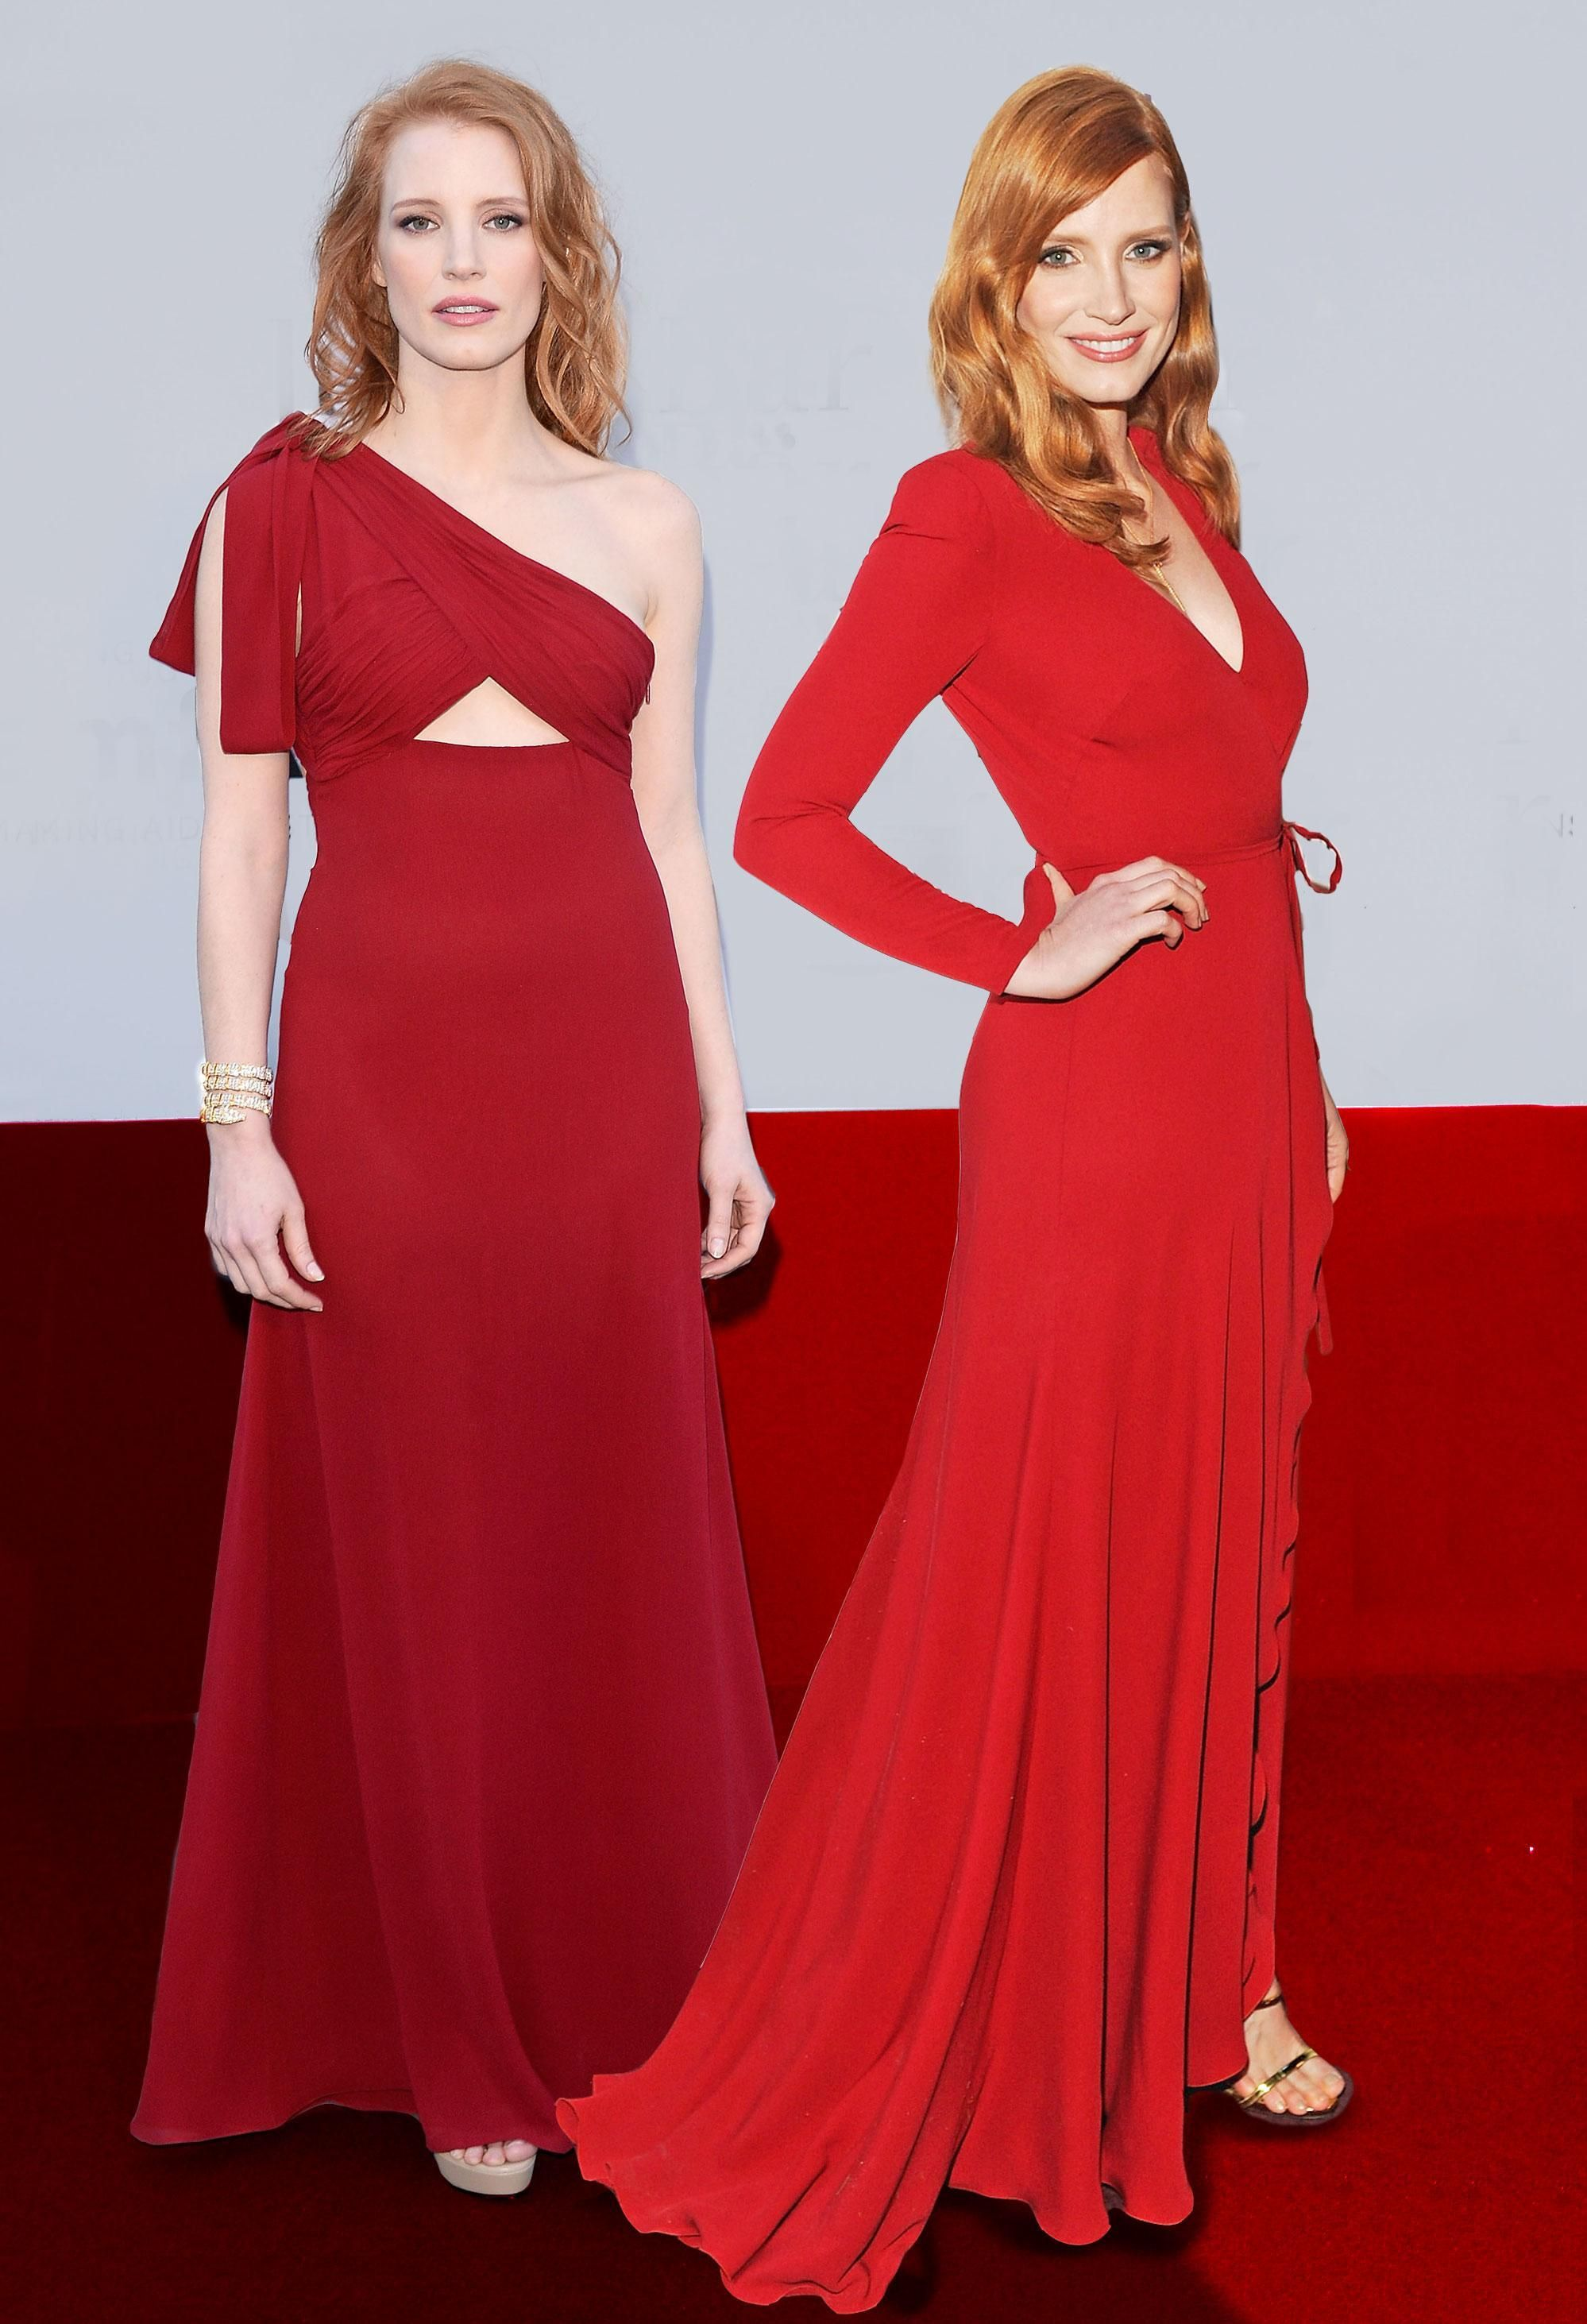 Break This Rule Redheads Wearing Red Redhead Fashion Wearing Red Fashion [ 2925 x 1998 Pixel ]